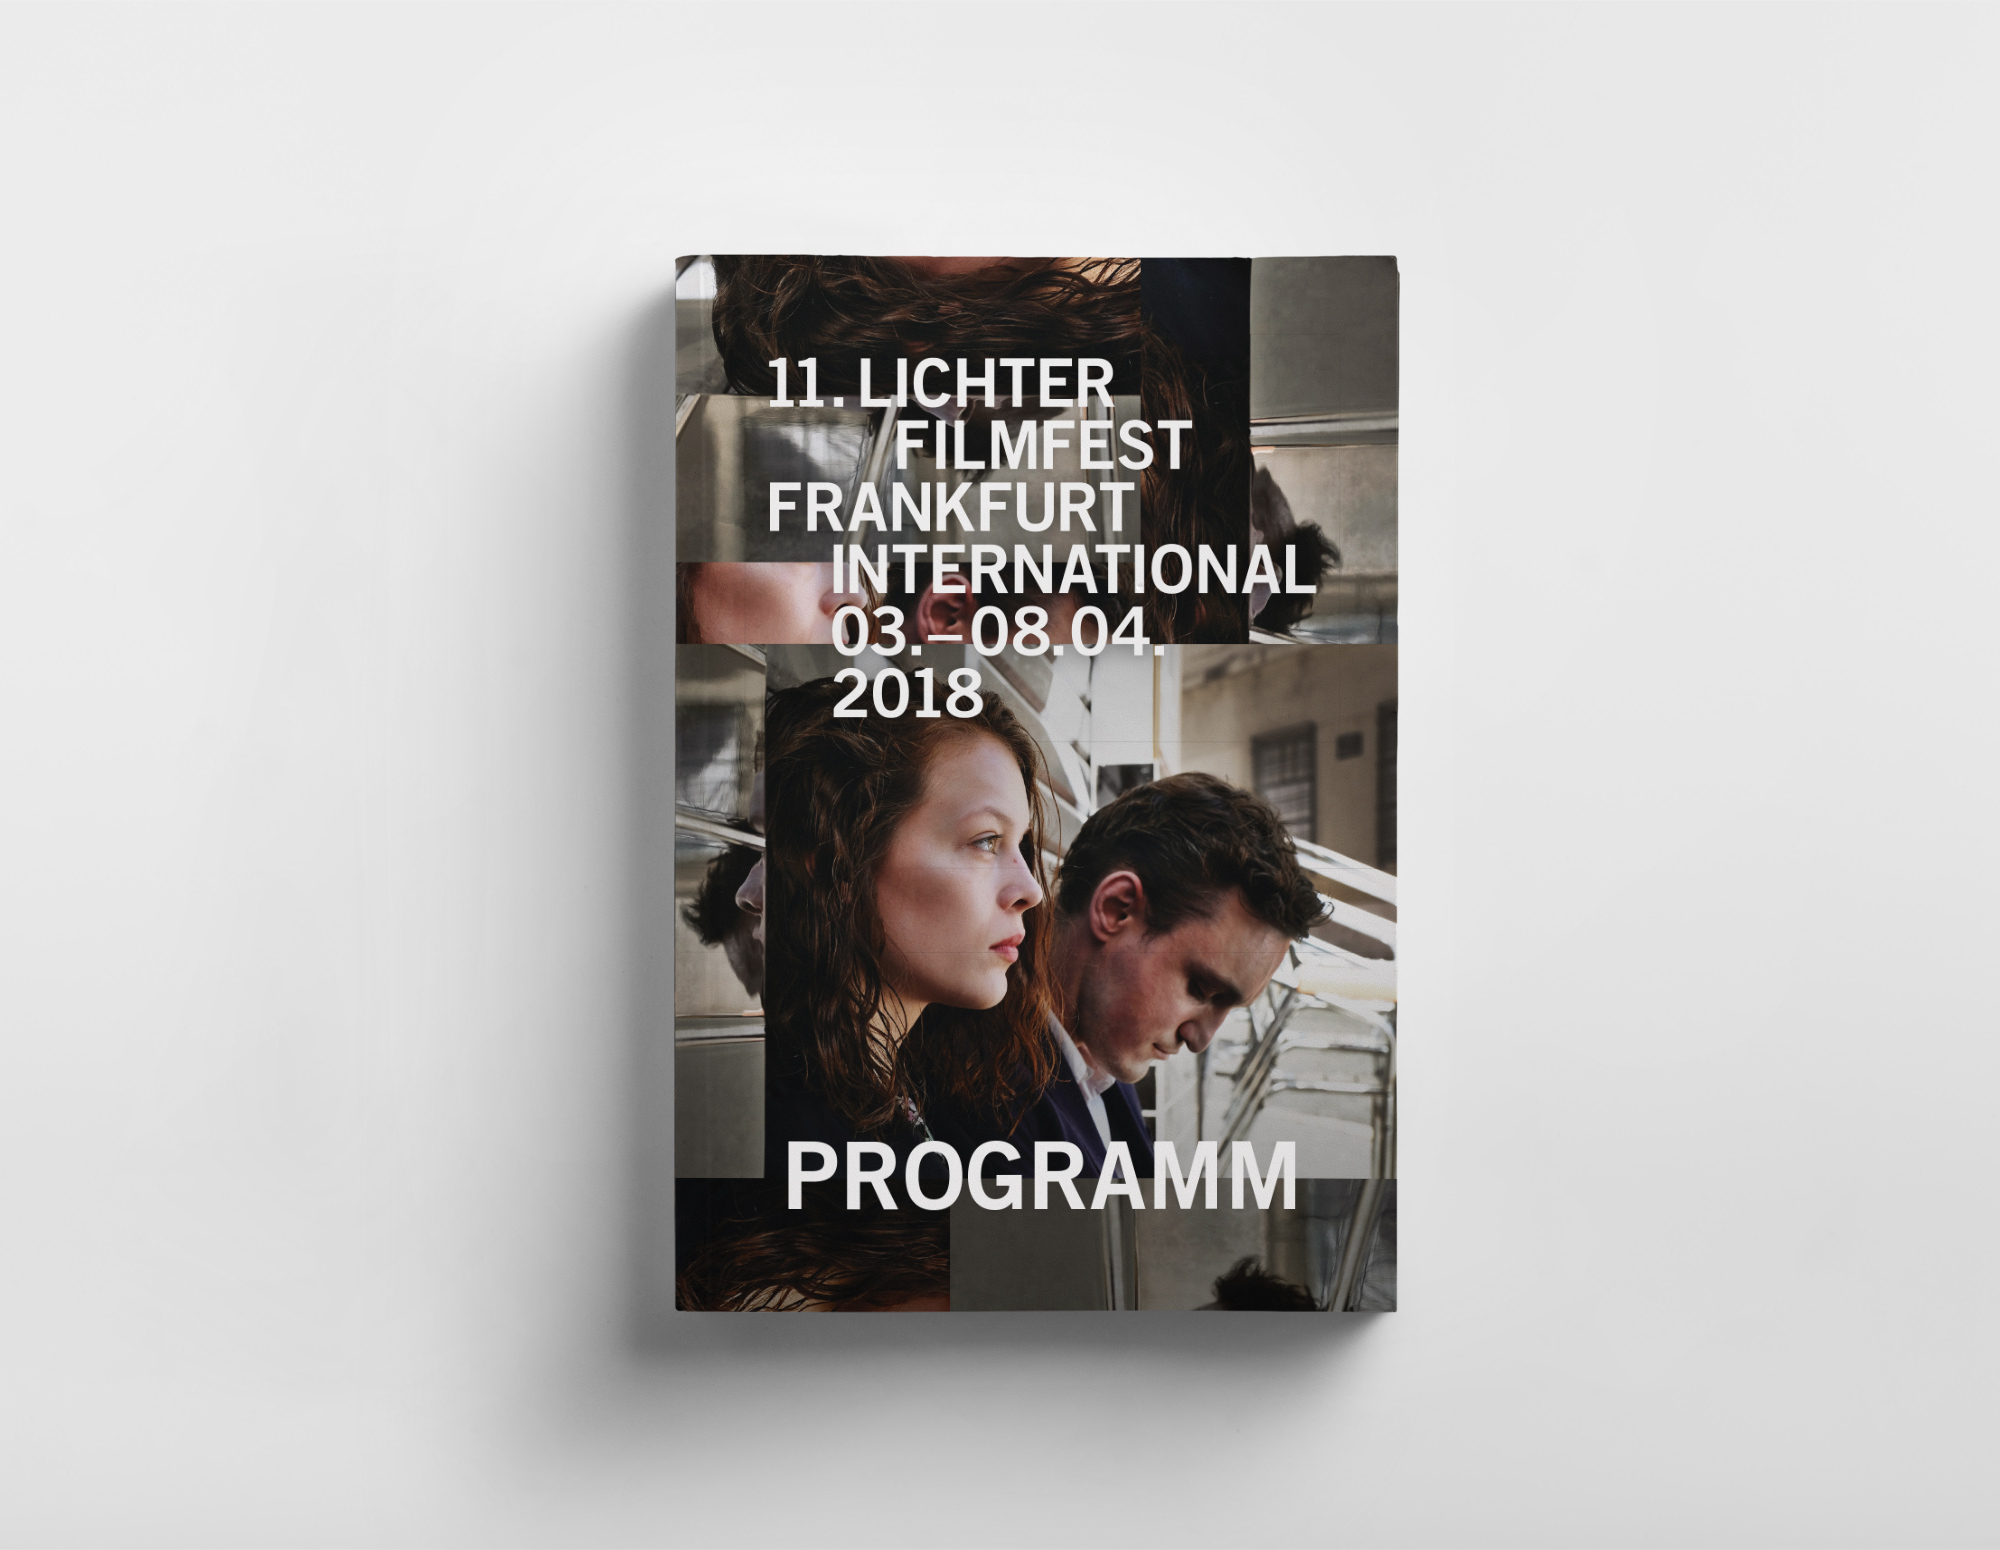 Lichter_2018_Programmheft_Mockup_Cover